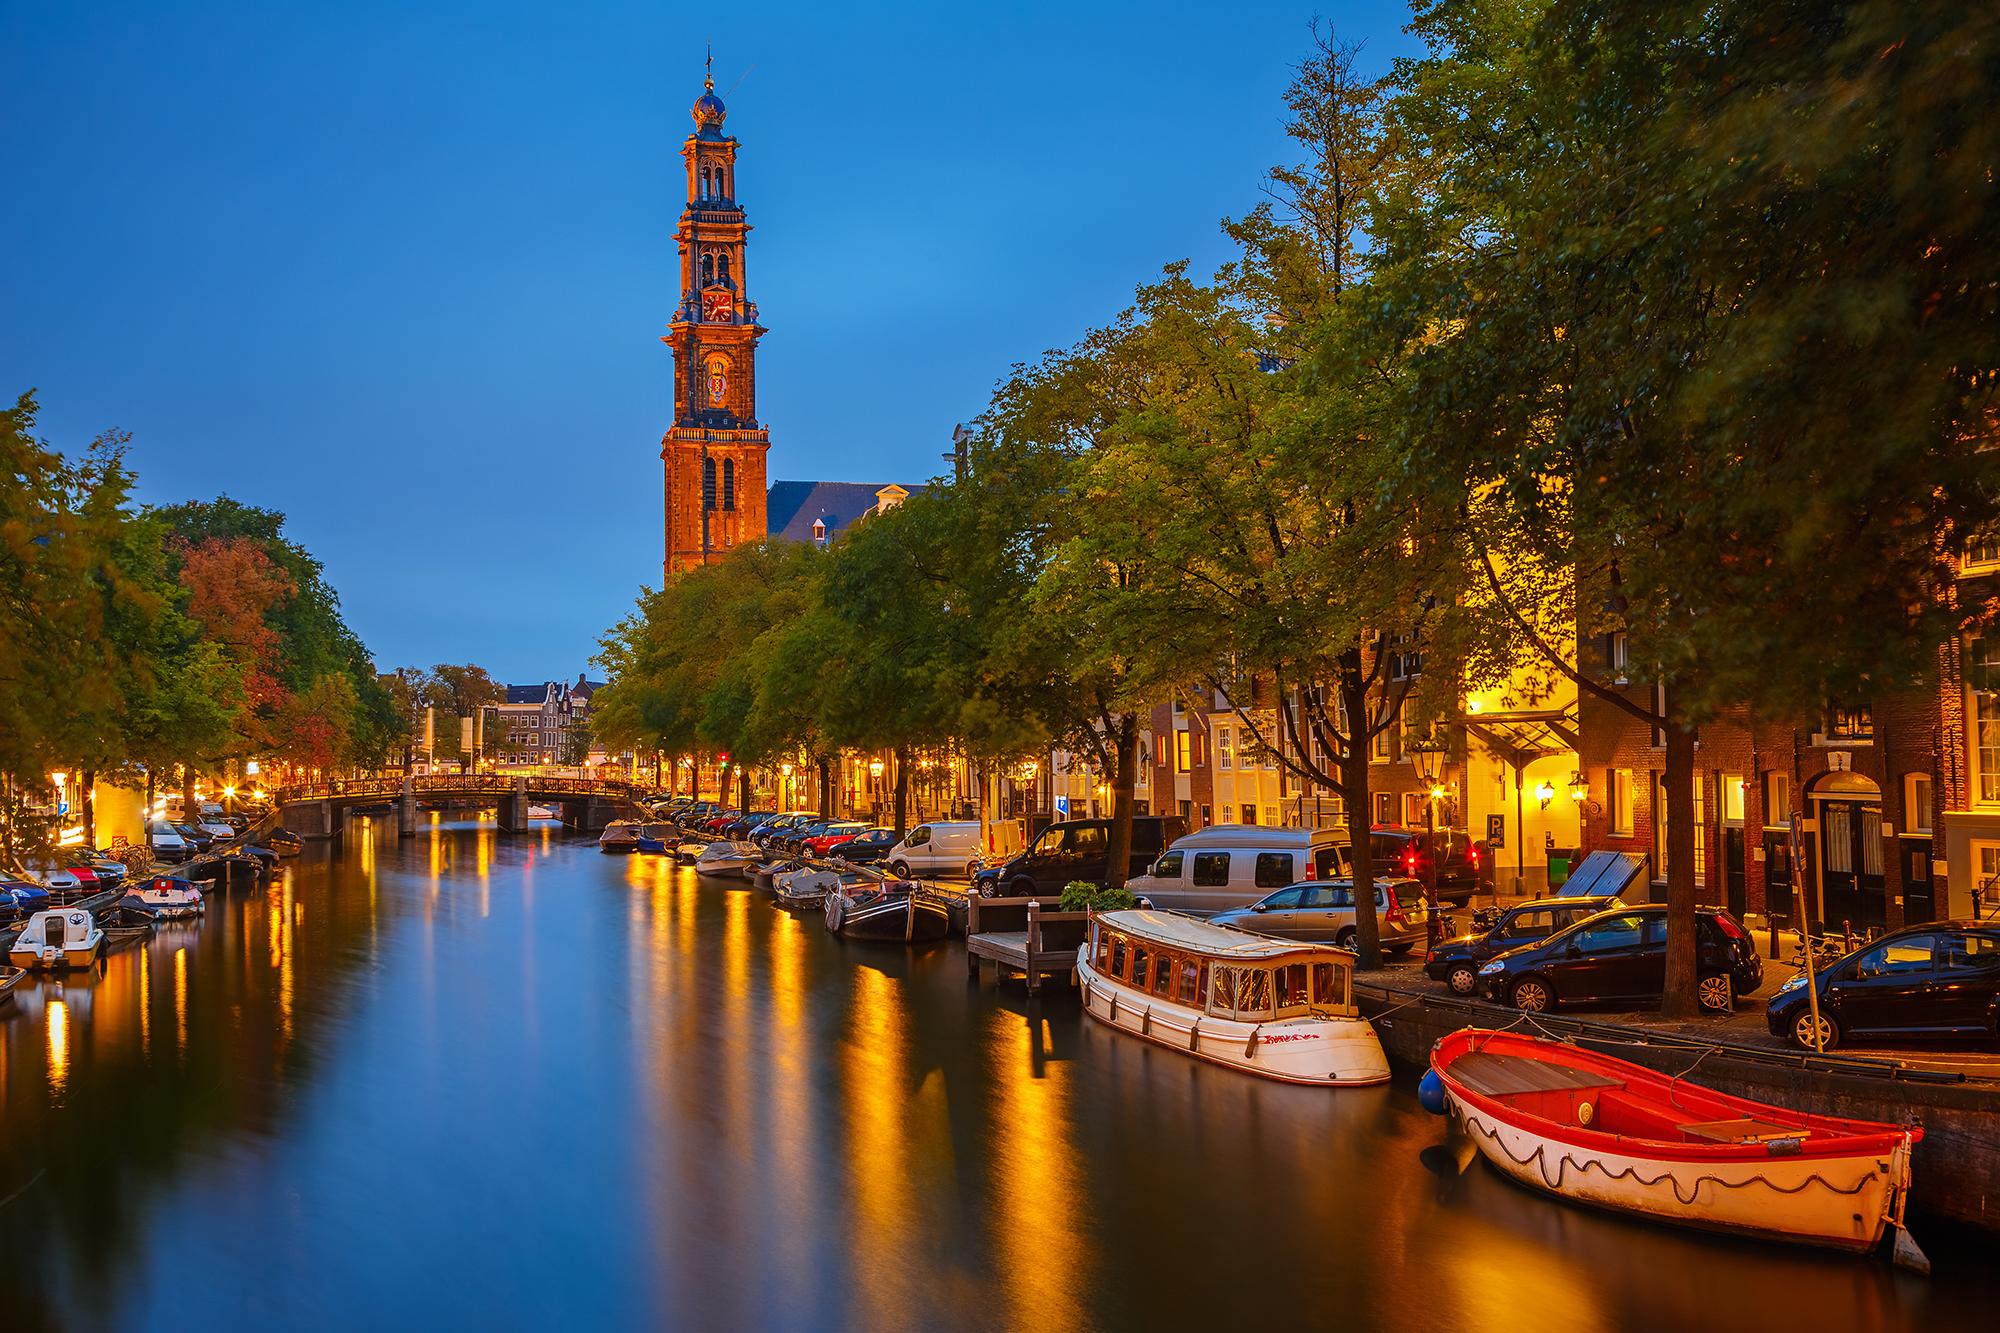 AmsterdamMedium